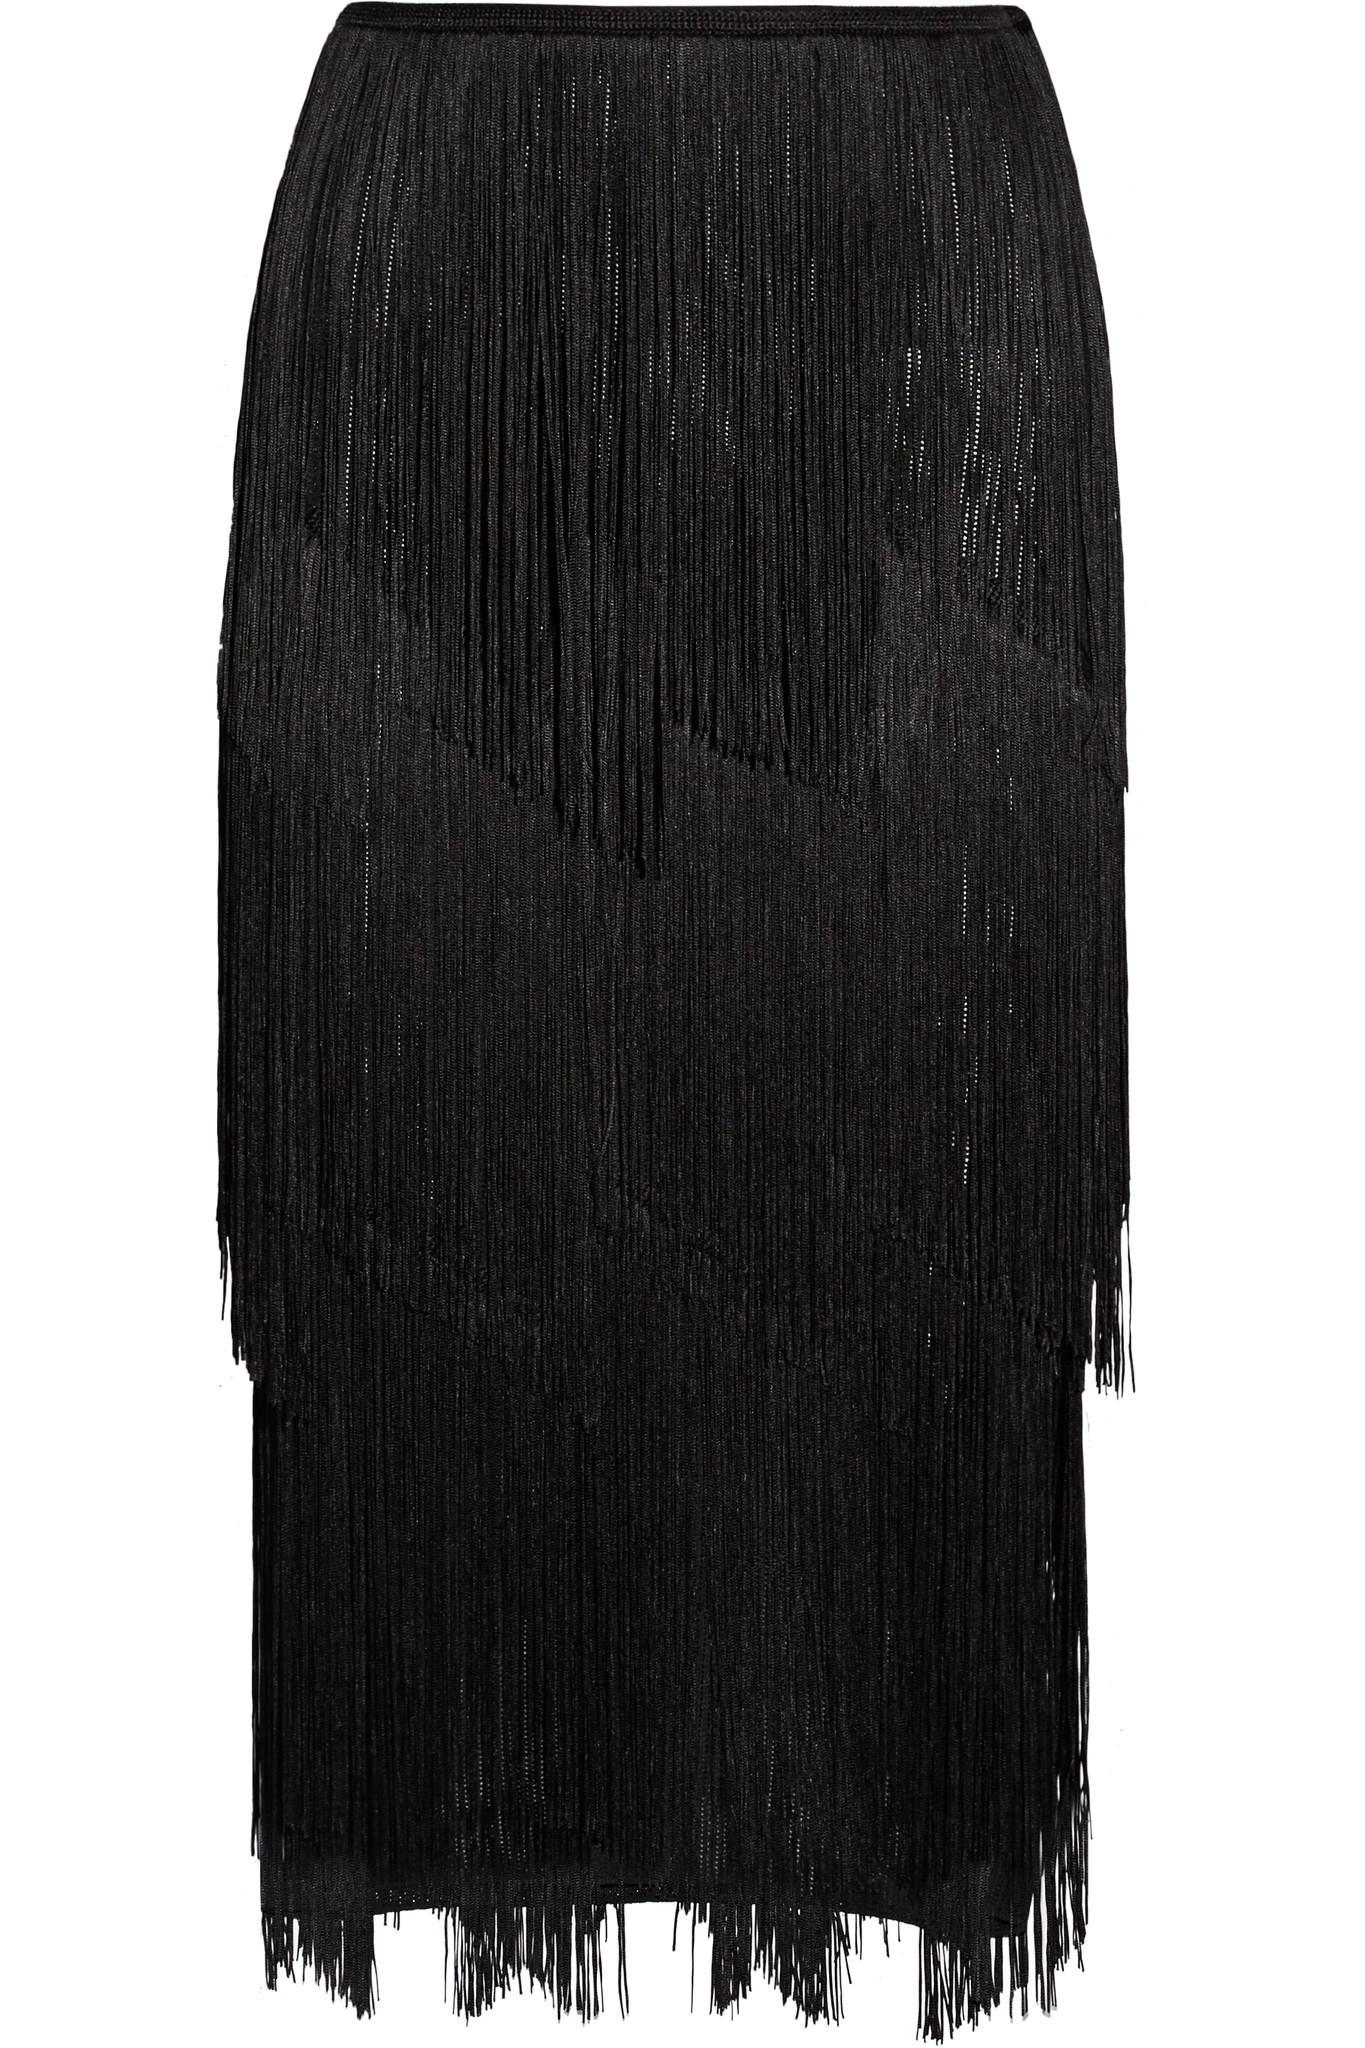 tom ford fringed stretch ribbed knit midi skirt in black